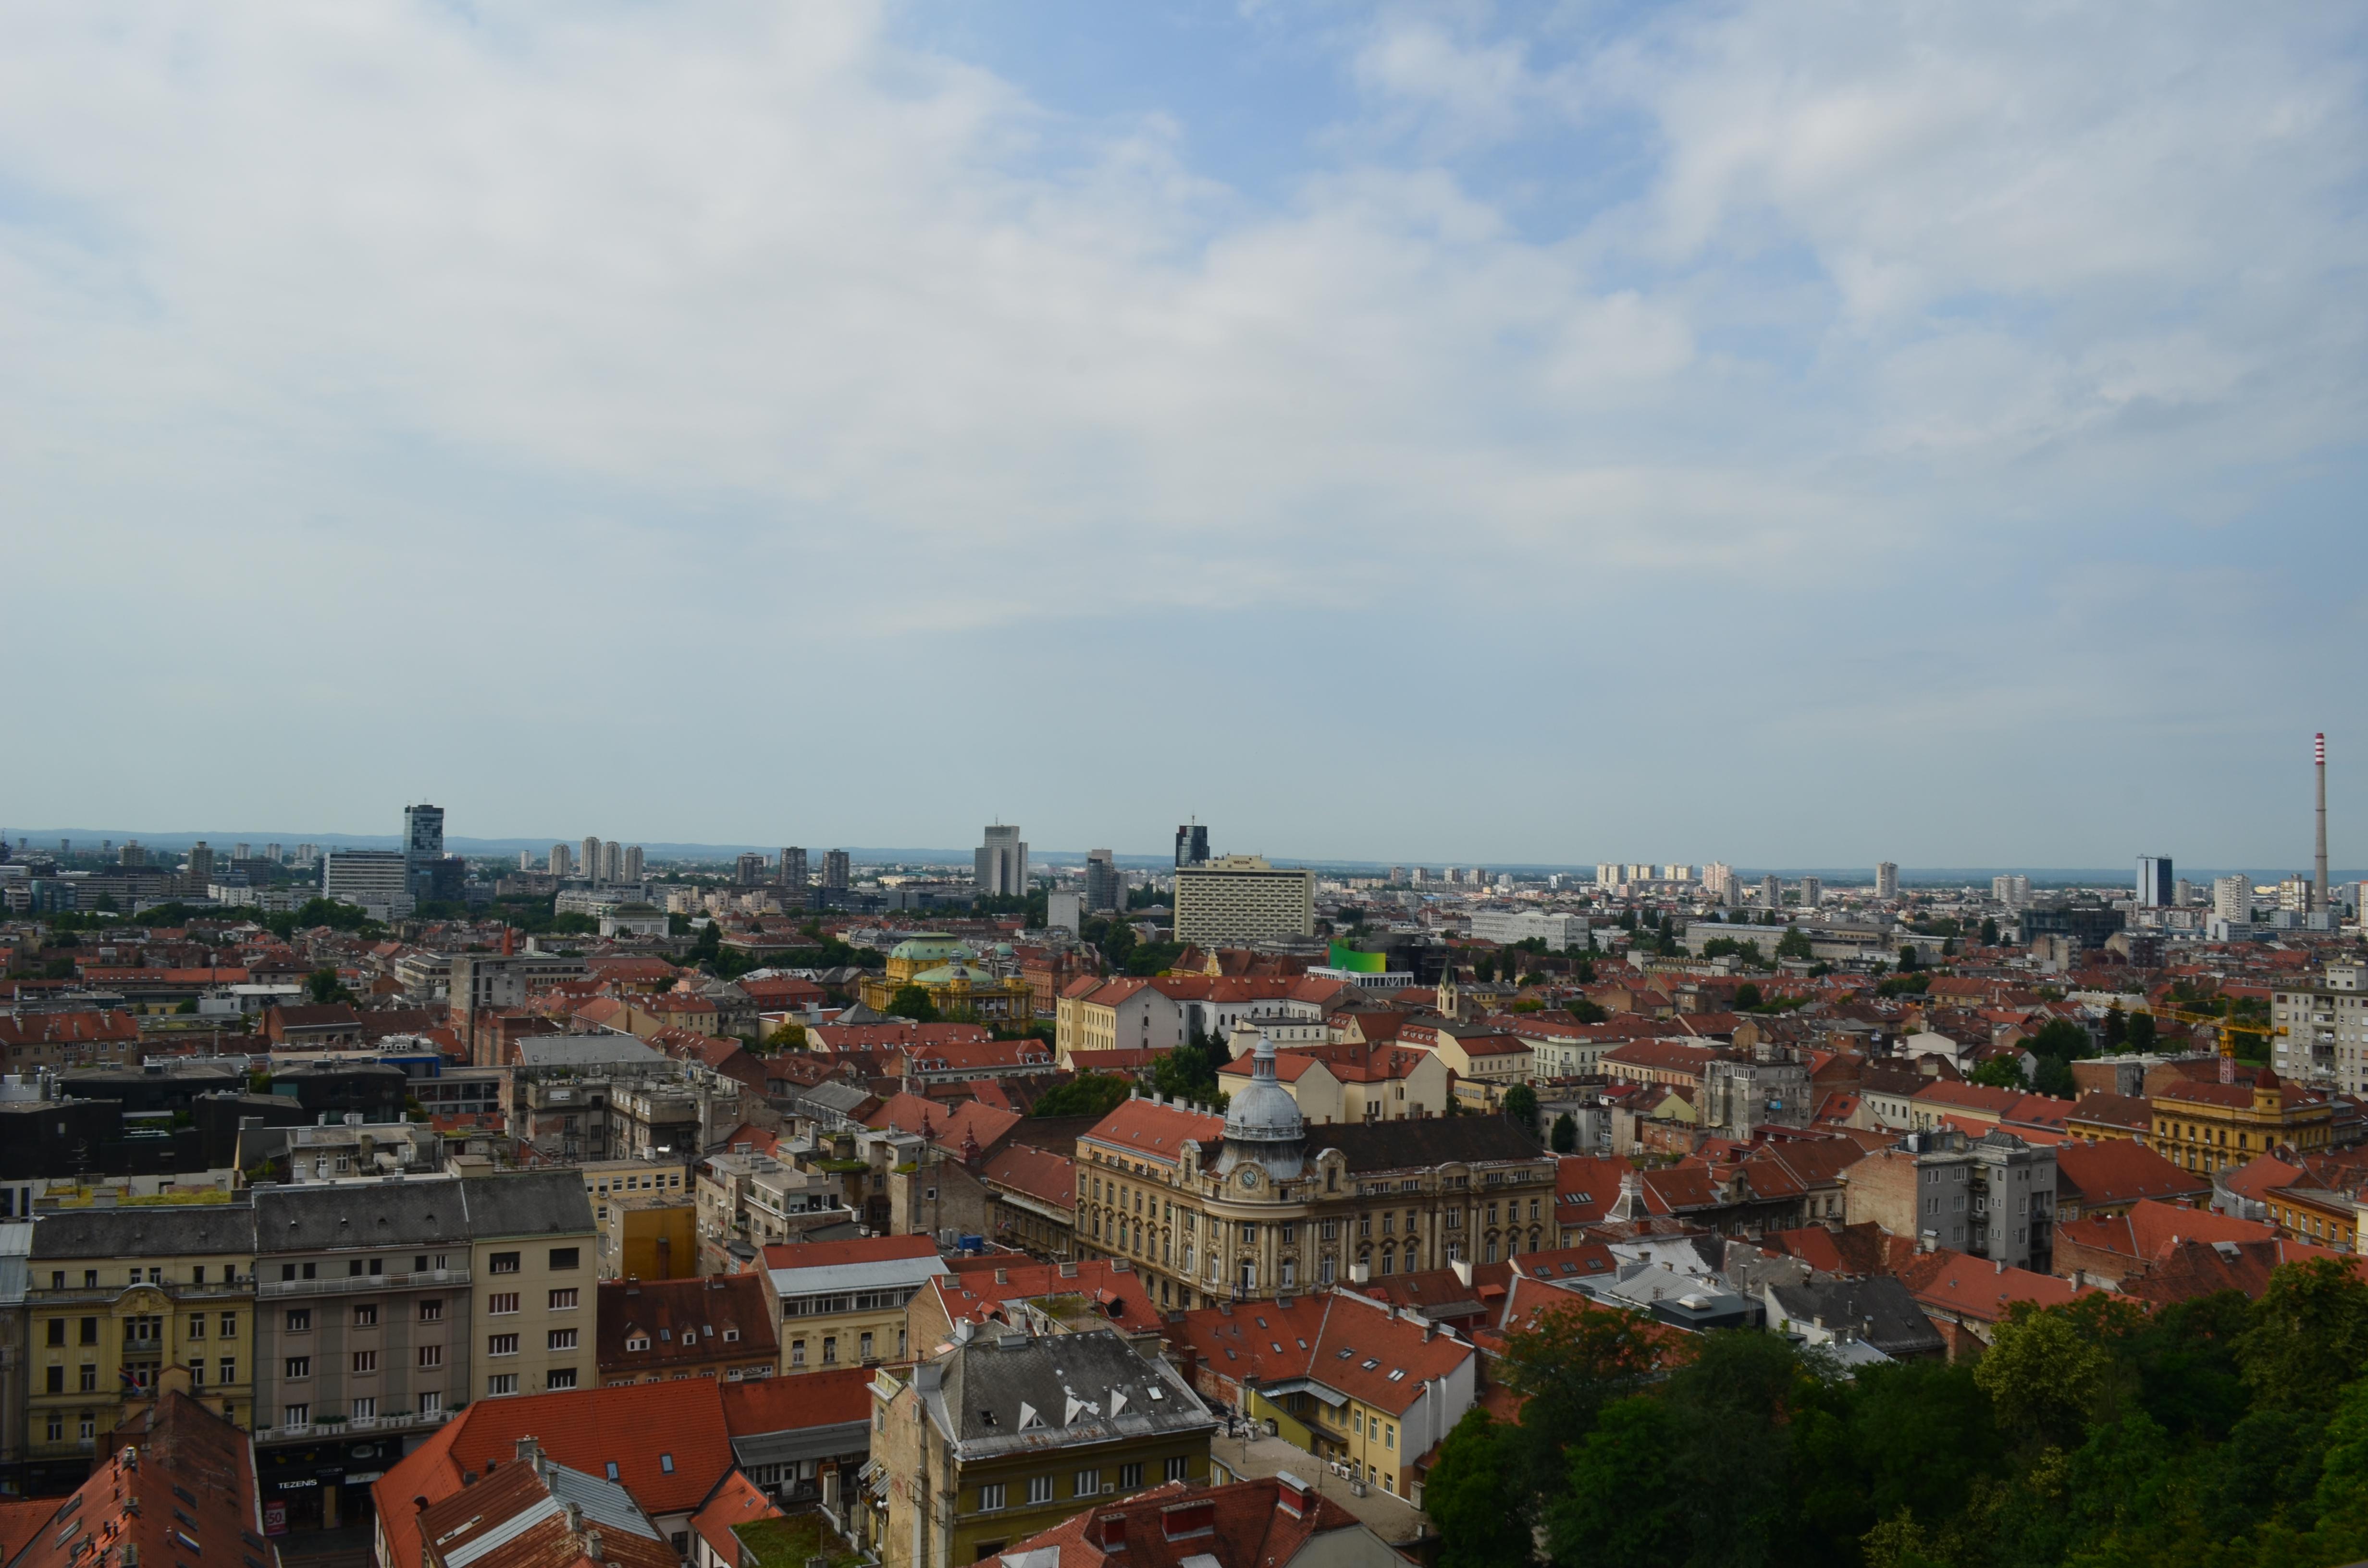 Cityguide // Wat te doen in Zagreb?